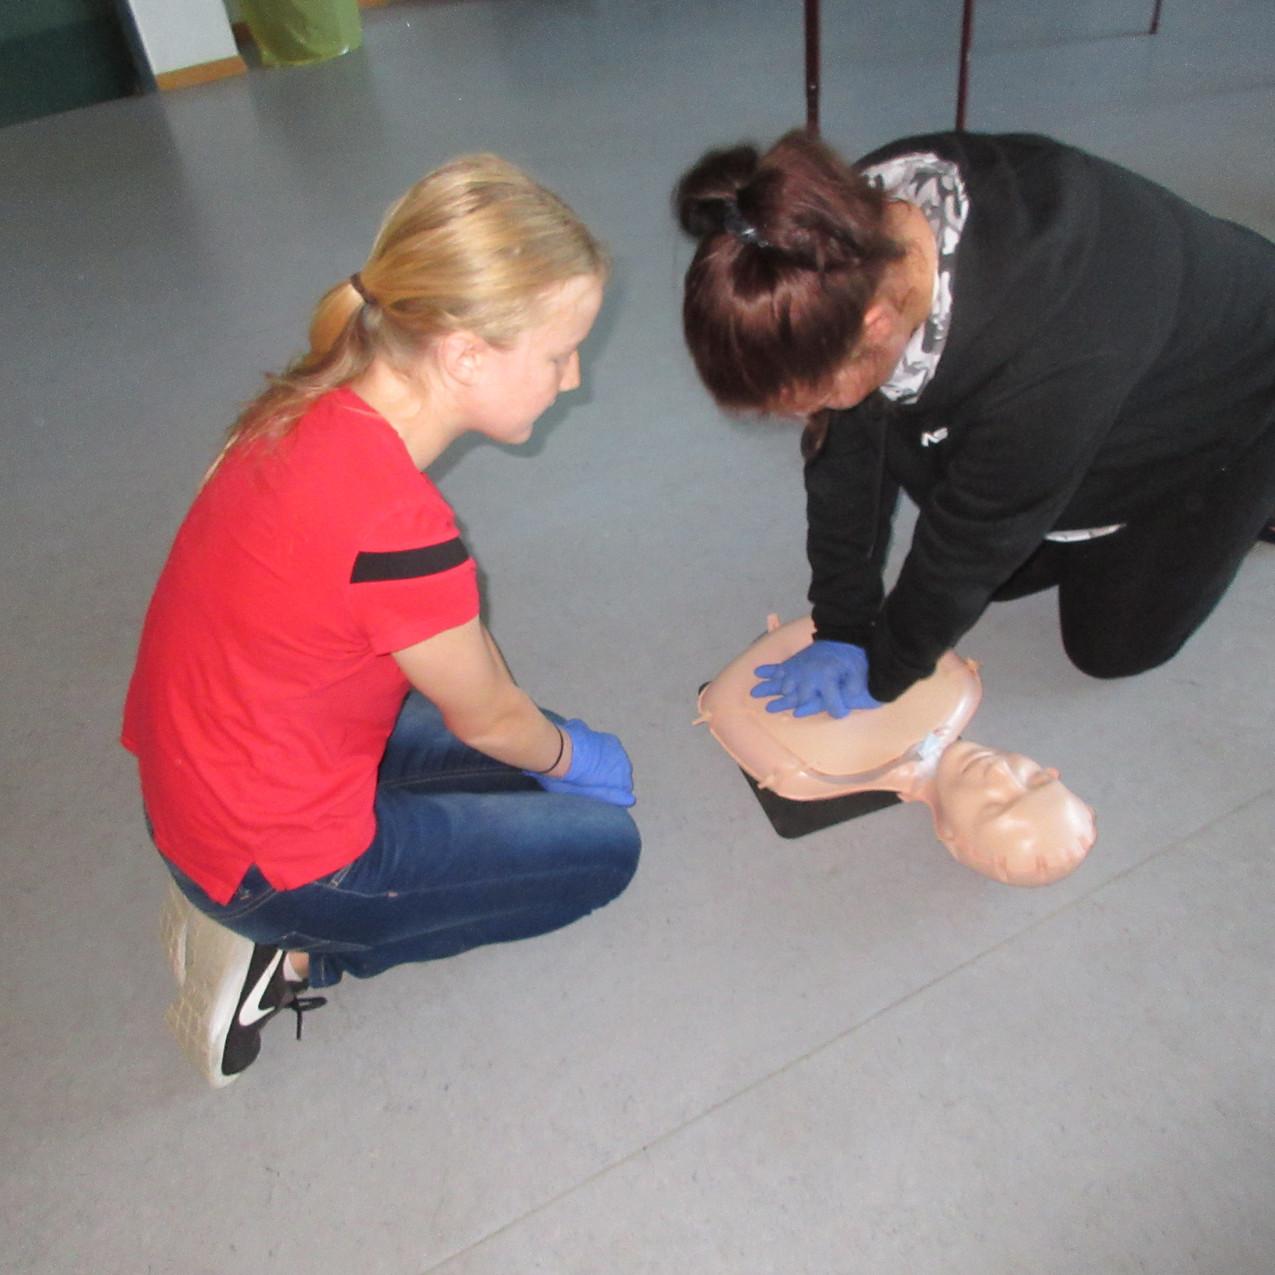 9-19 Kids save lives , Projekttage 018